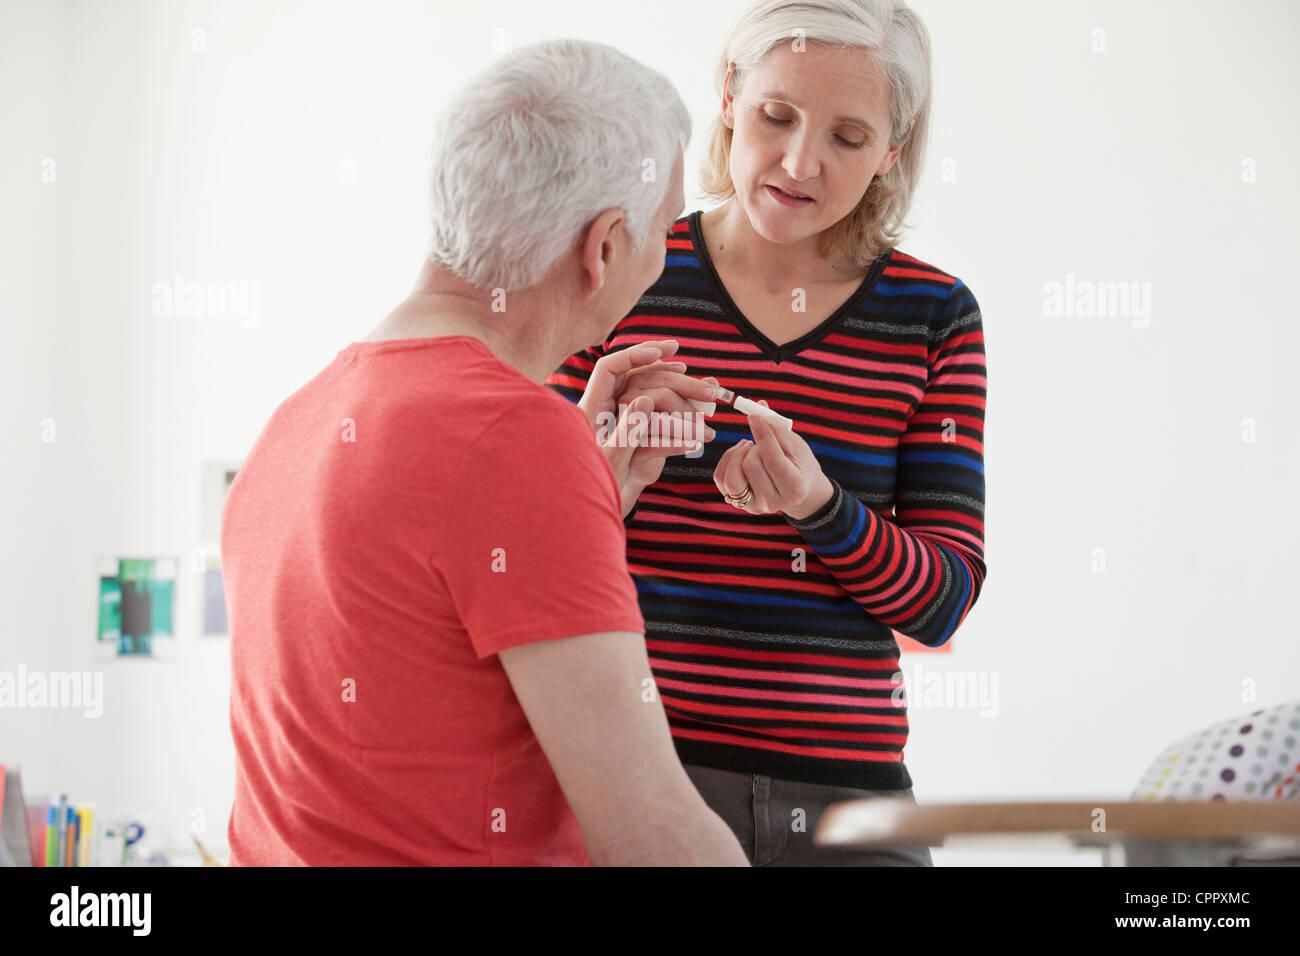 SMOKING TREATMENT ELDERLY PERSON - Stock Image